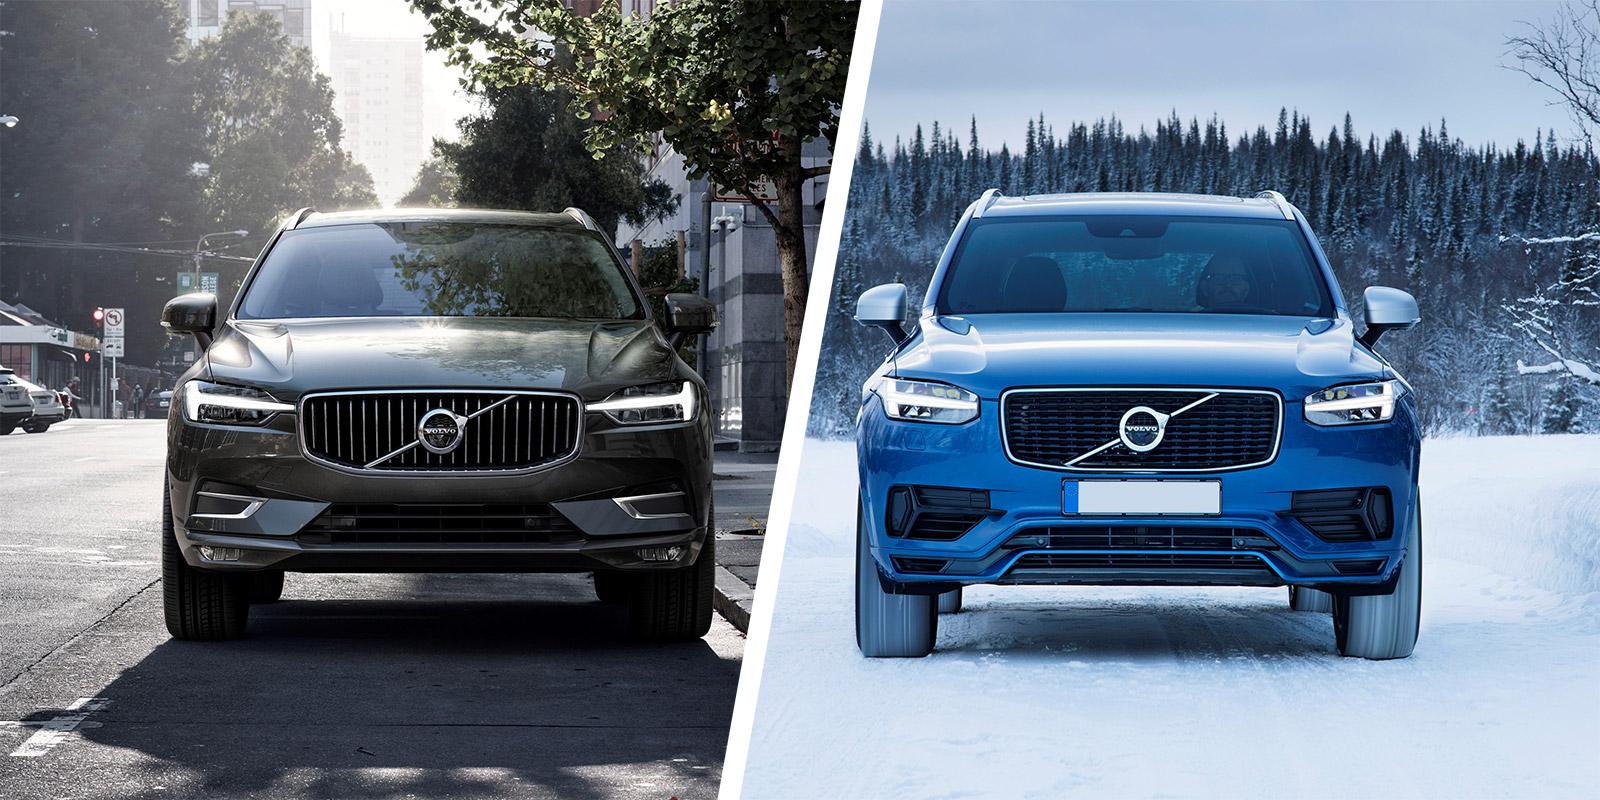 Volvo Xc60 Vs Volvo Xc90 Suv Comparison Carwow